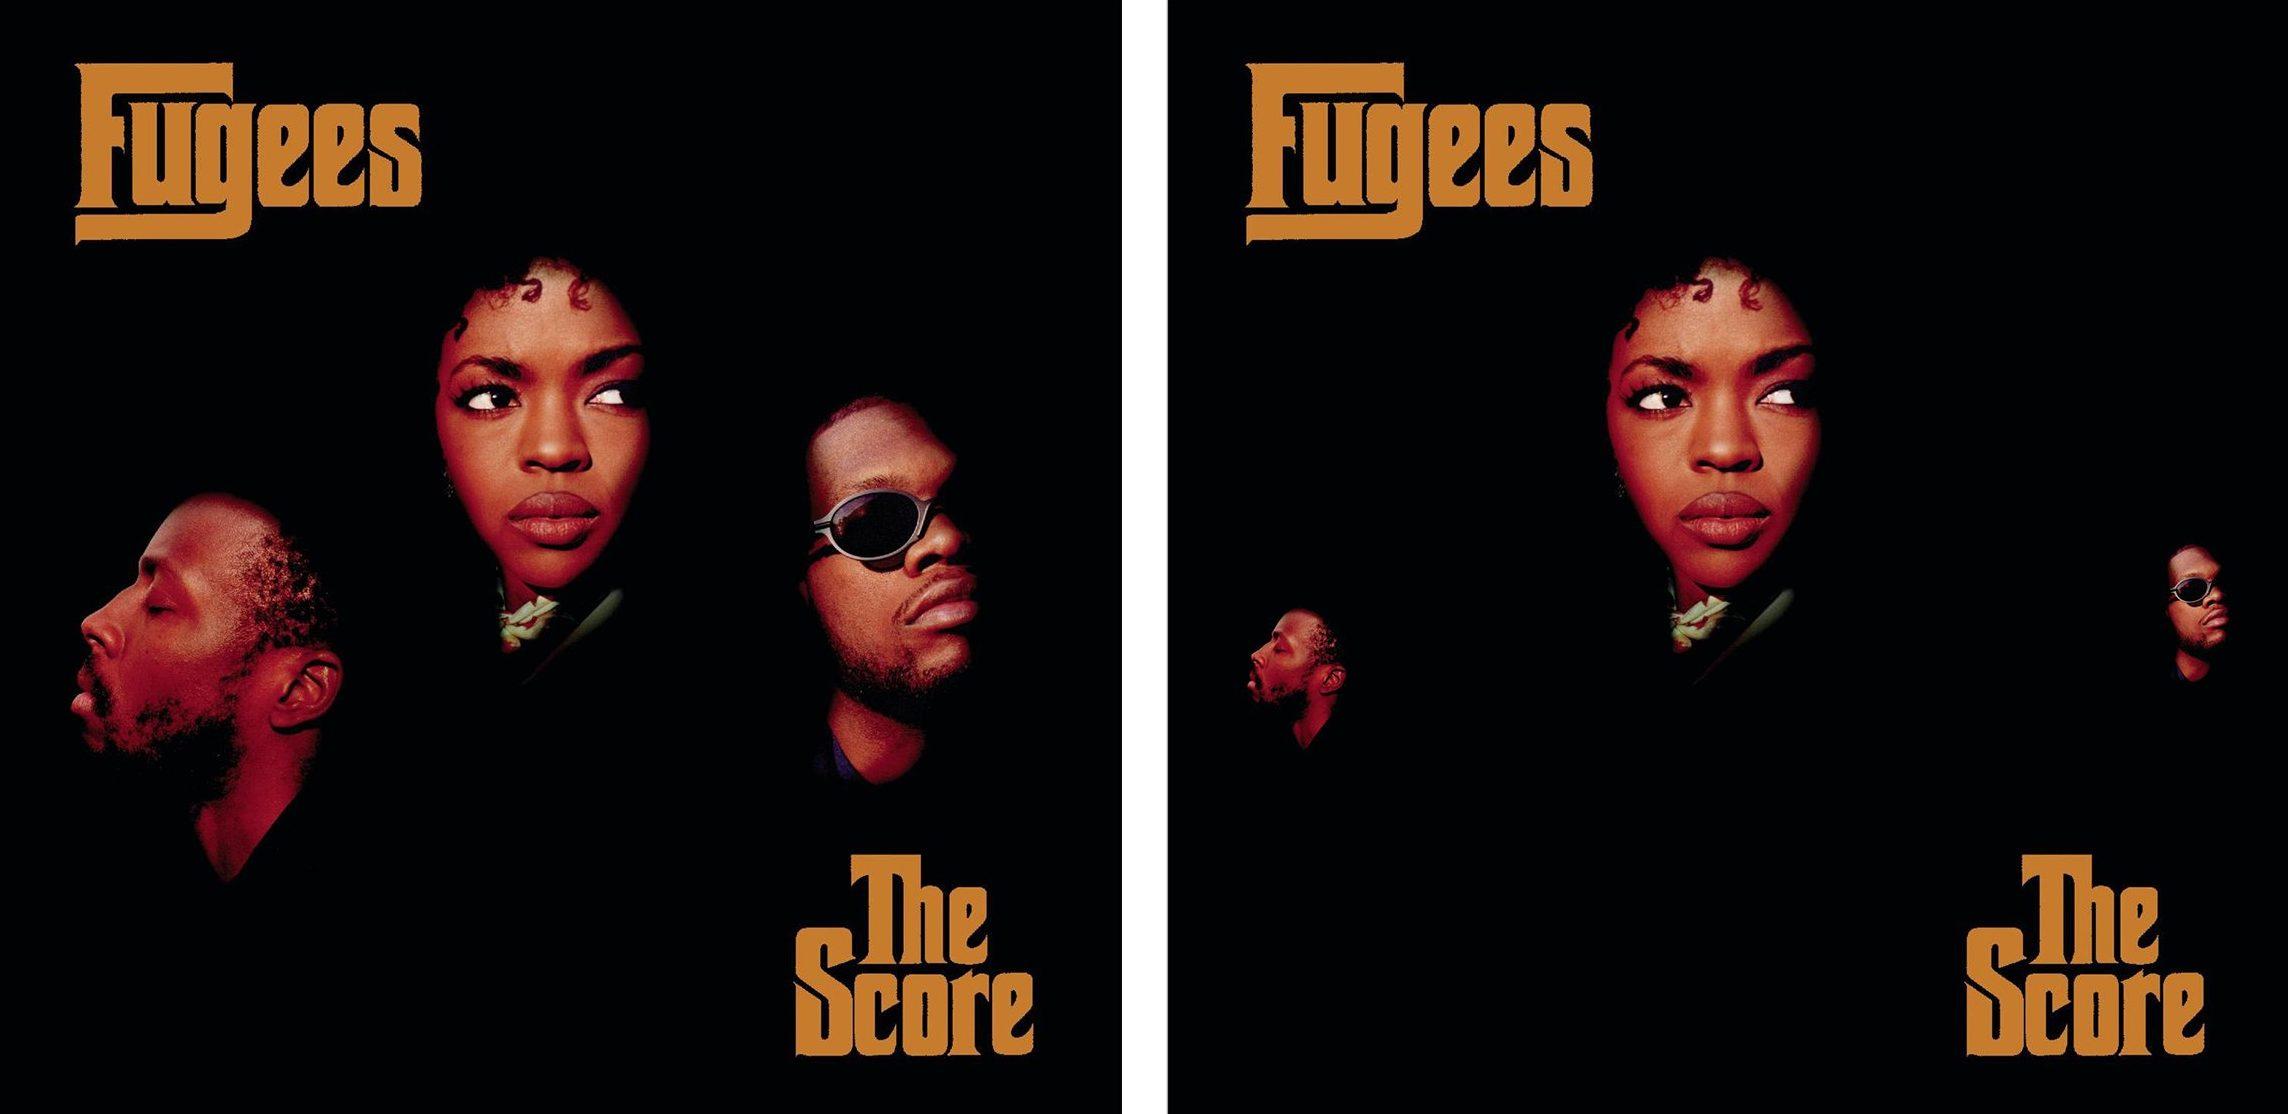 'Social distancing' hits classic album covers